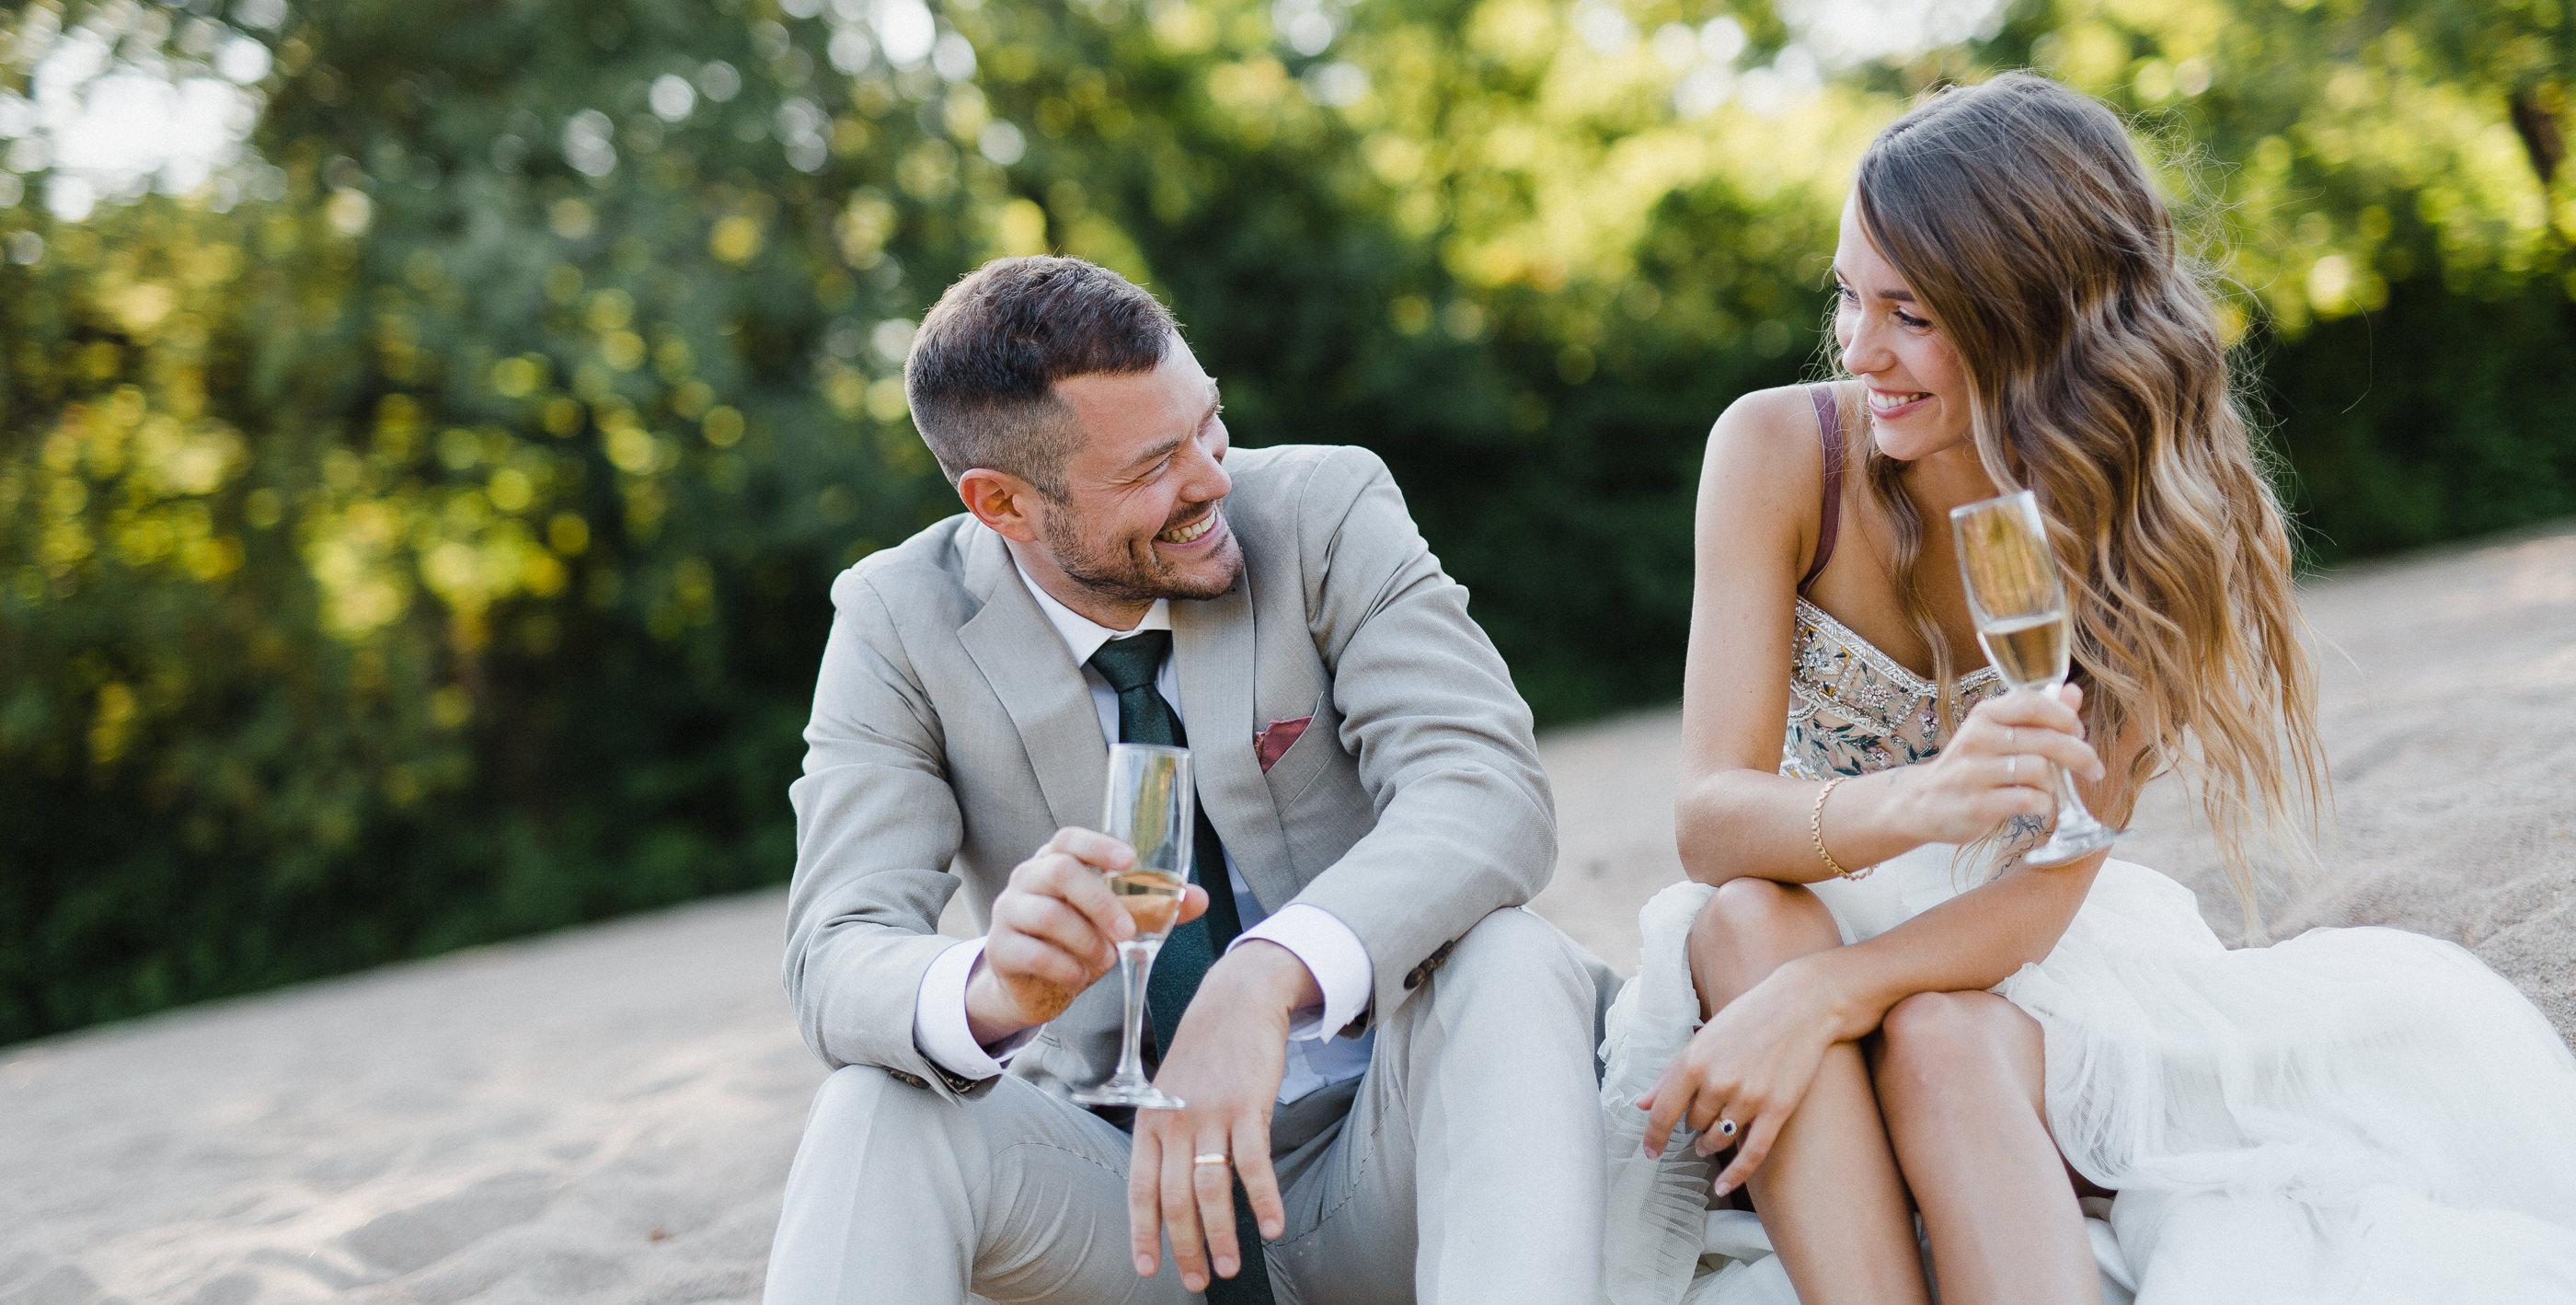 portfolio-photographies-de-mariage-sonia-bourdon-025